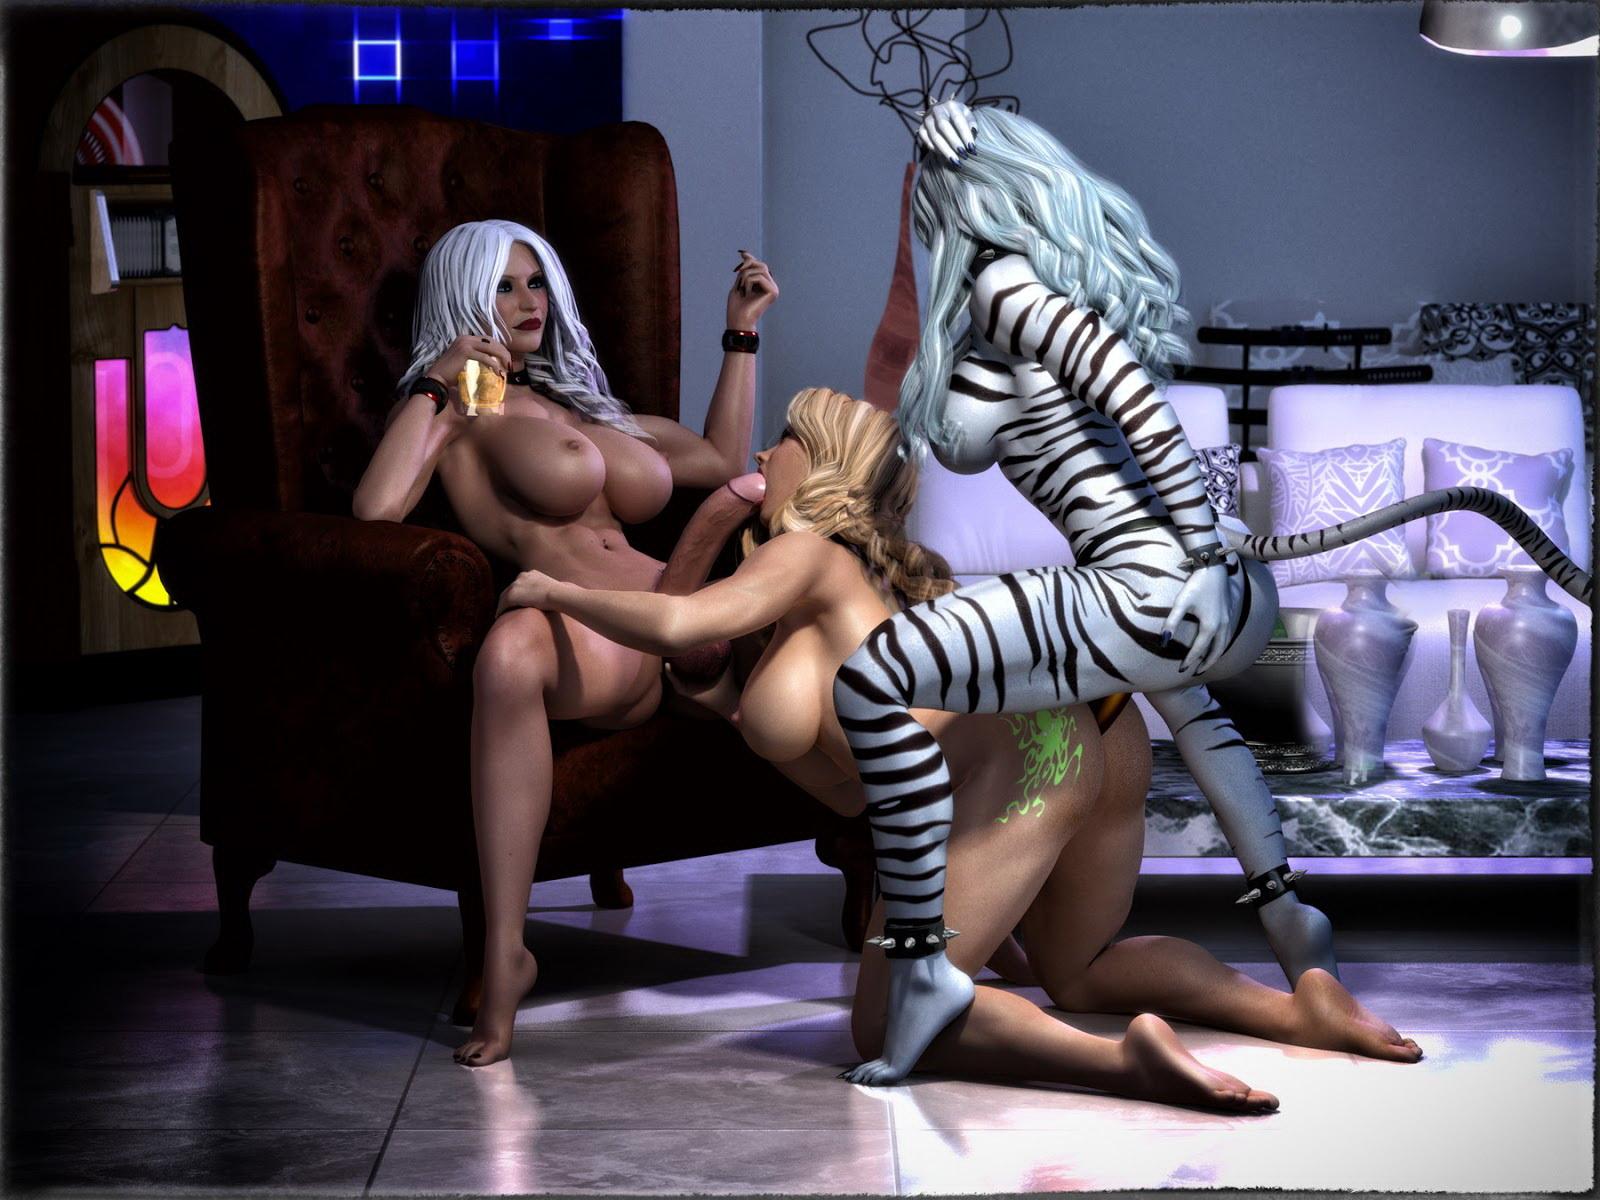 Midget women showing thier open pussies